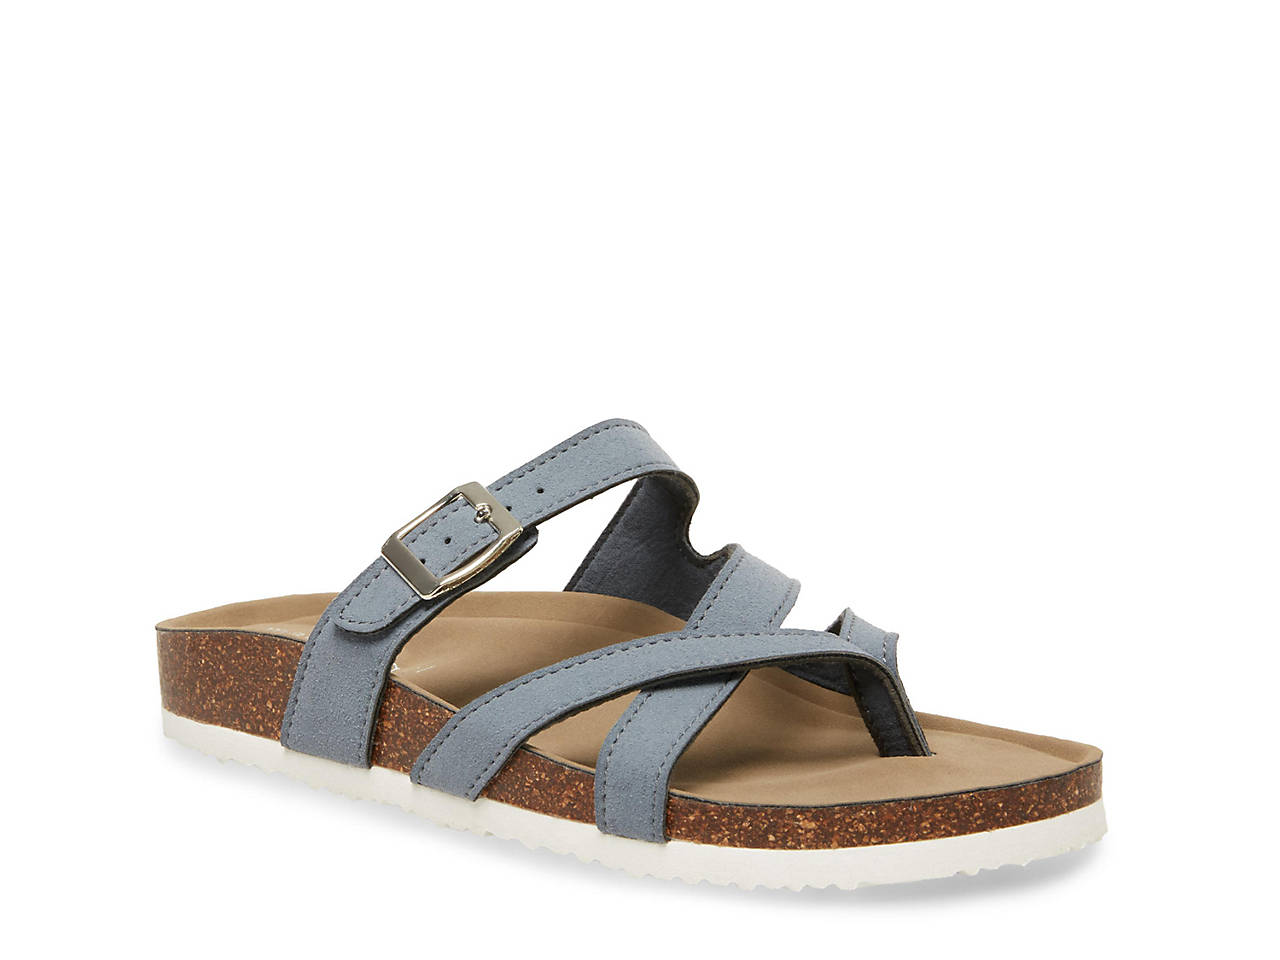 31d125ac05f632 Madden Girl Bartlet Sandal Women s Shoes